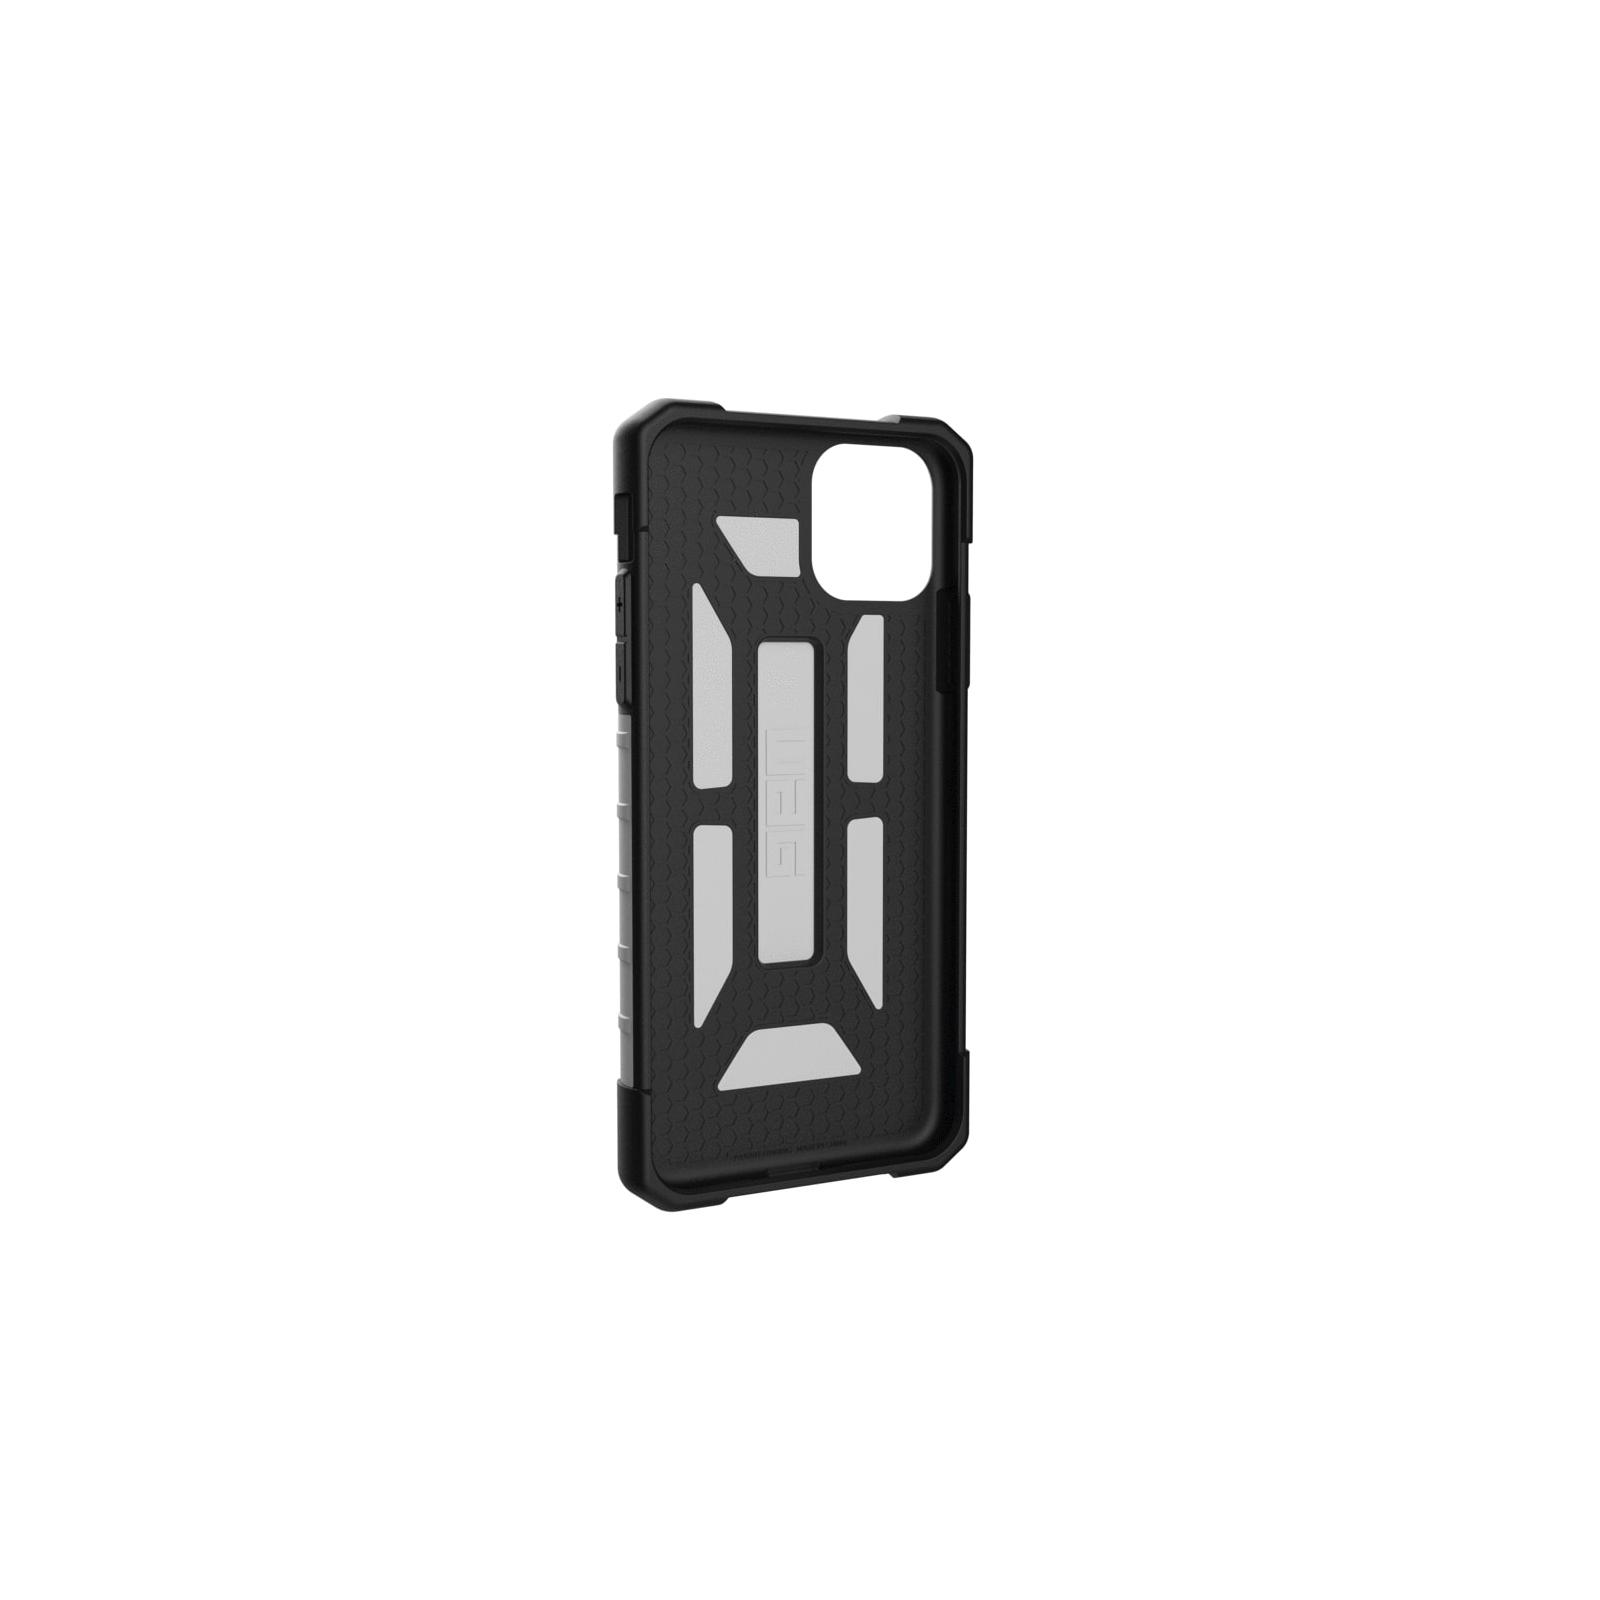 Чехол для моб. телефона Uag iPhone 11 Pro Max Pathfinder, Slate (111727115454) изображение 4